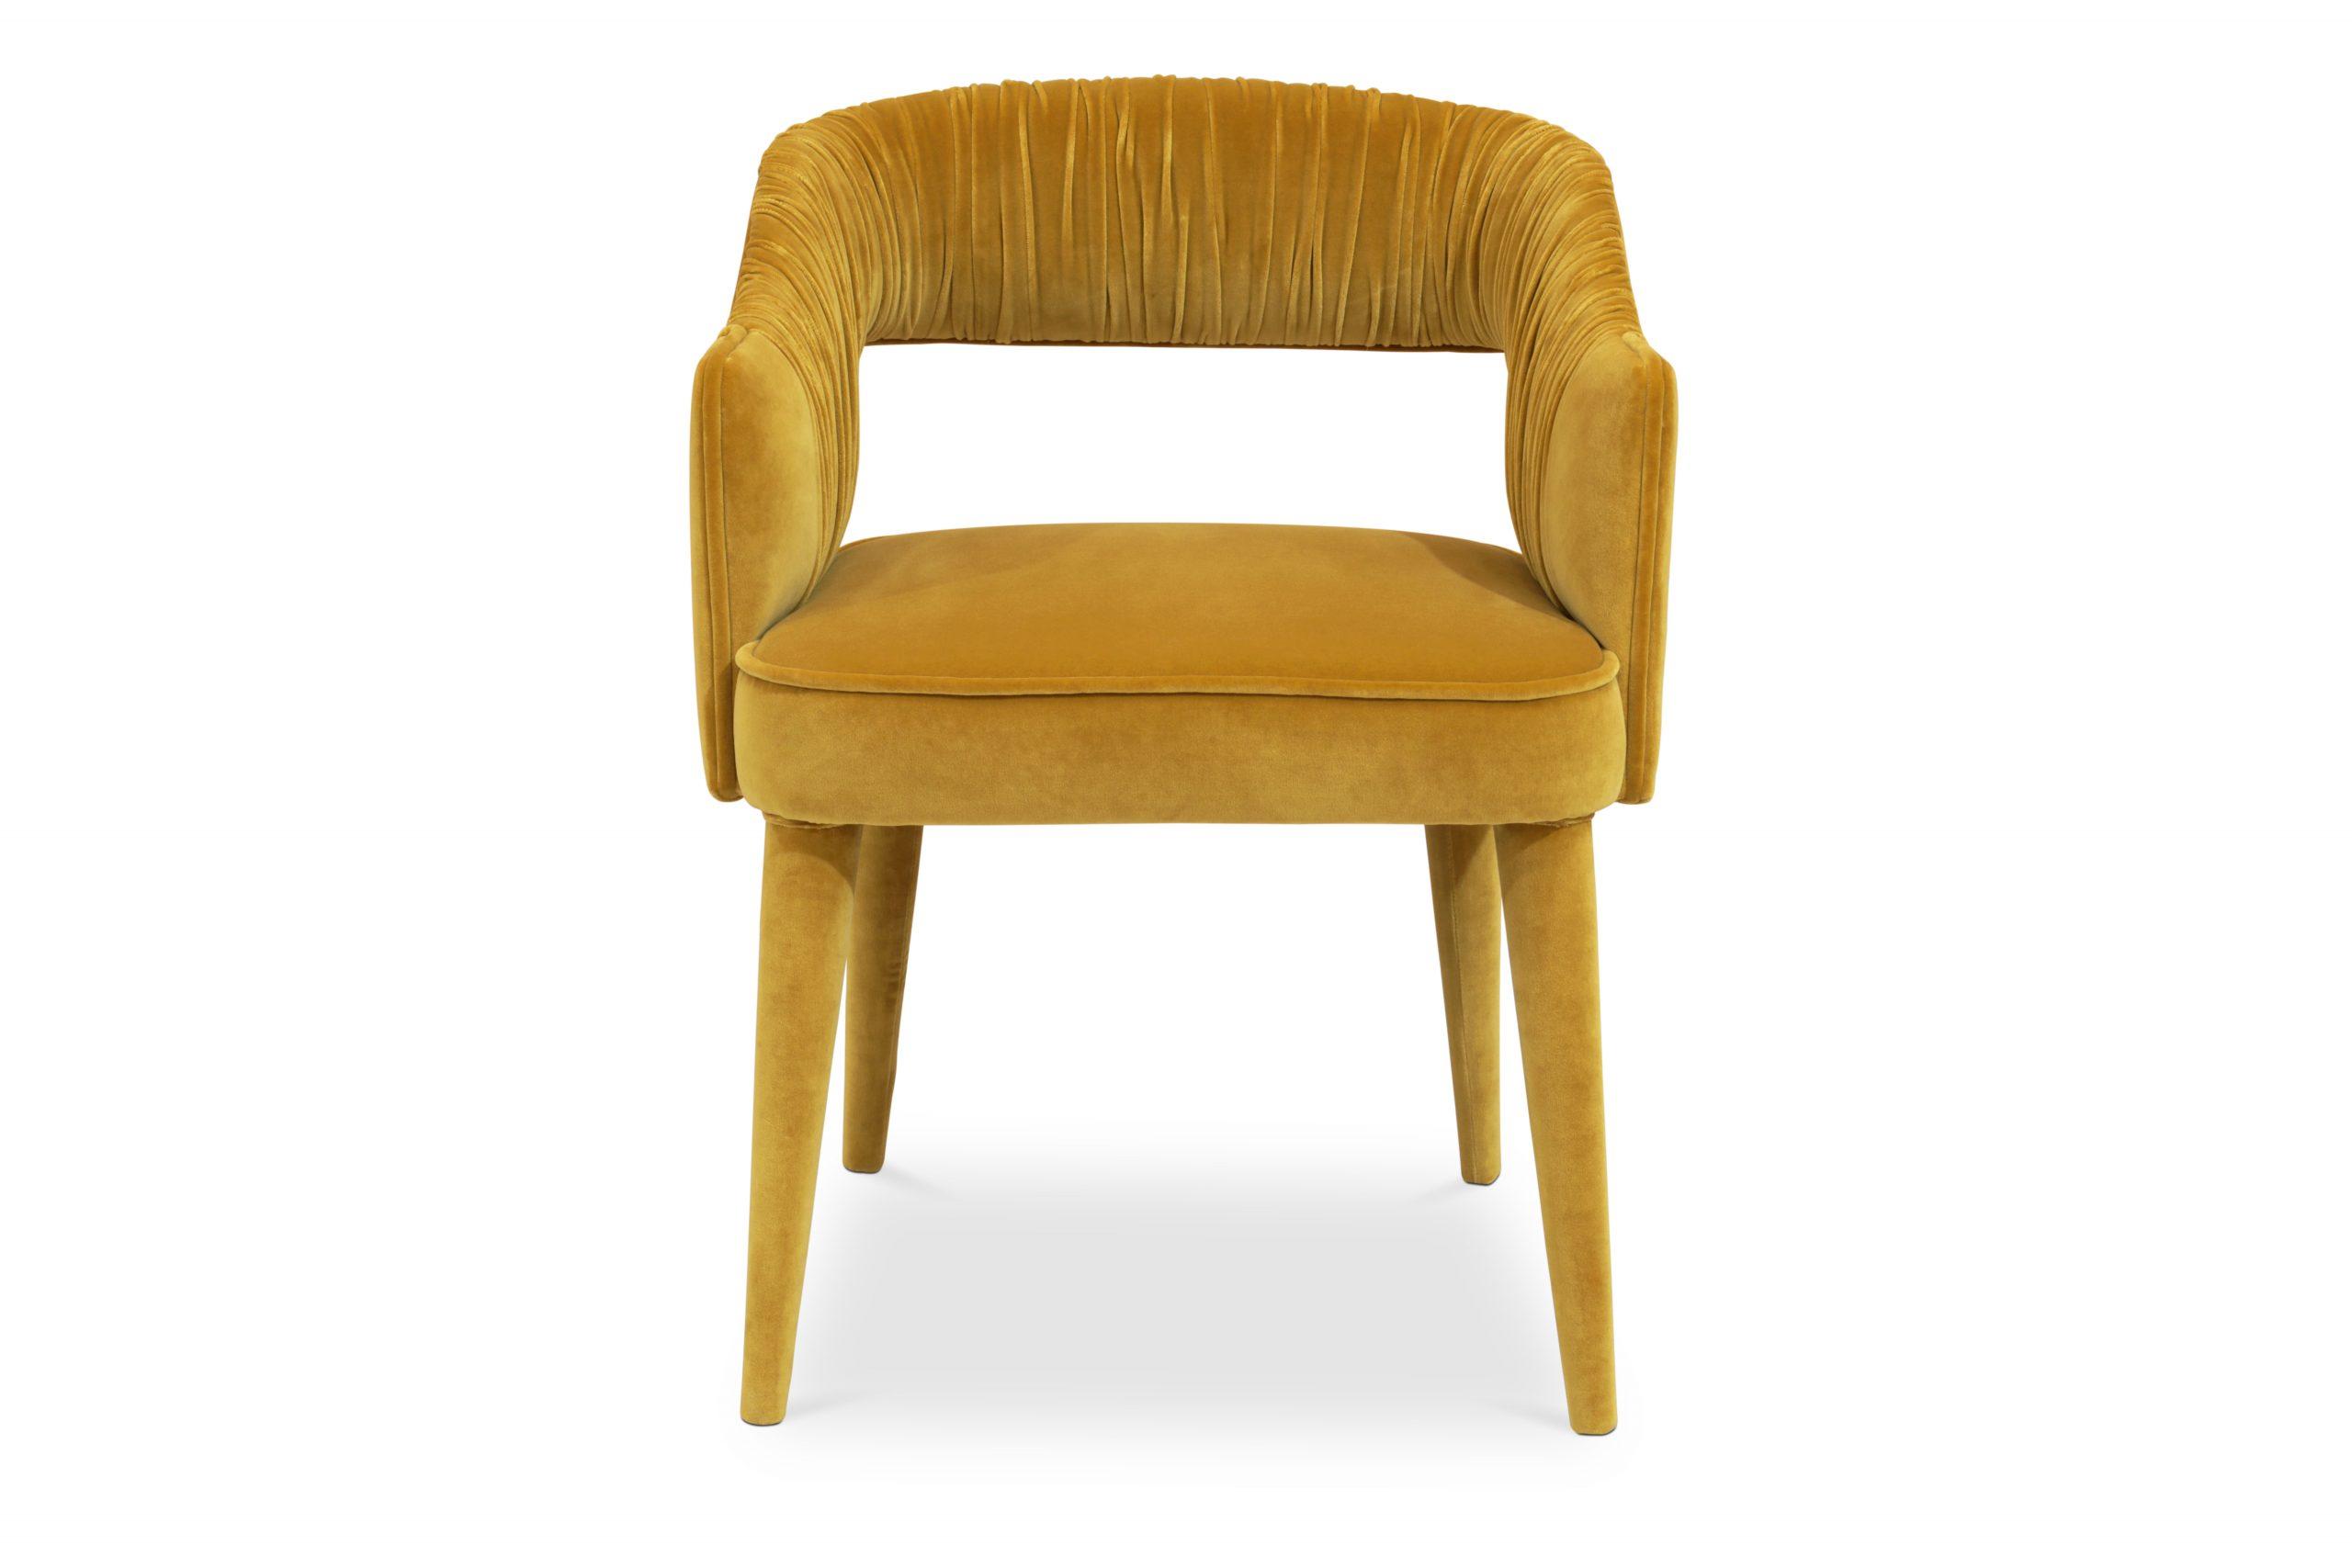 STOLA Dining Chair; Dining Chair; Upholstery; Modern; Sophistication; Elegance; Classiness; Comfort; Fierceness; BRABBU; Design; Furniture stola dining chairSTOLA Dining Chair: A Symbol of Elegance and SophisticationSTOLA Dining chair 1 scaled